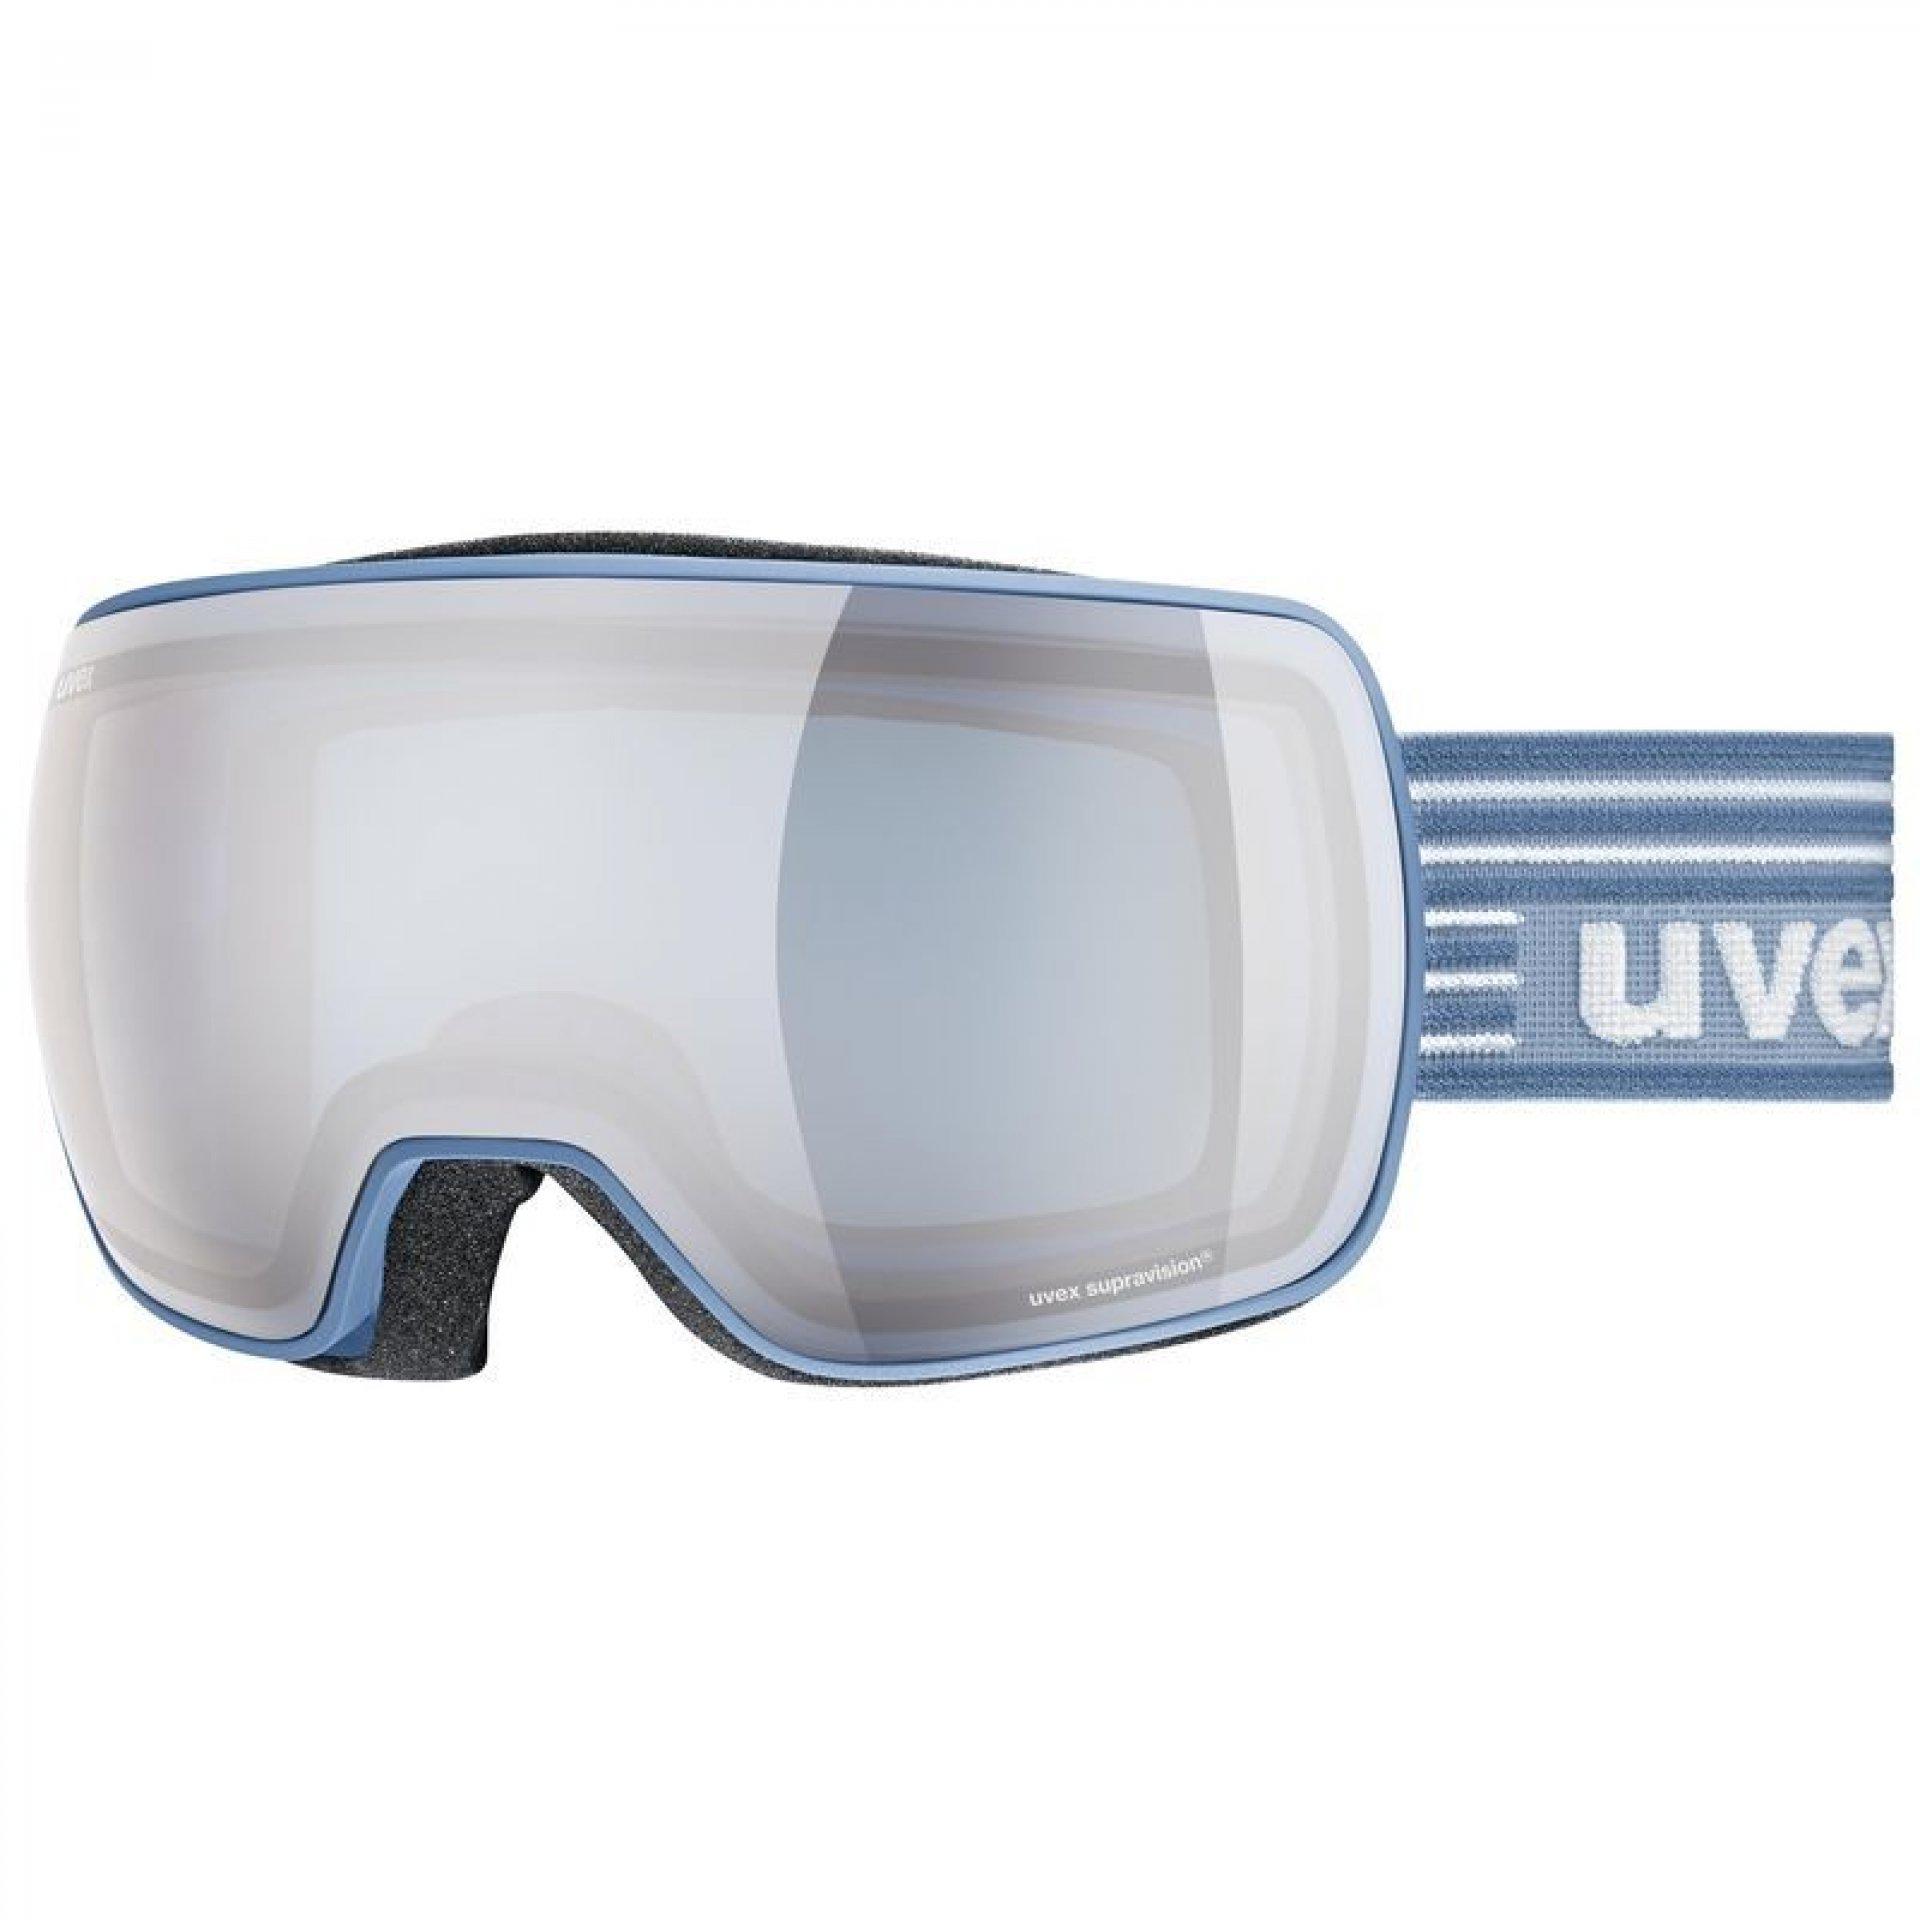 GOGLE UVEX COMPACT FM LAGUNE MAT|MIRROR SILVER BLUE 55|0|130|4130